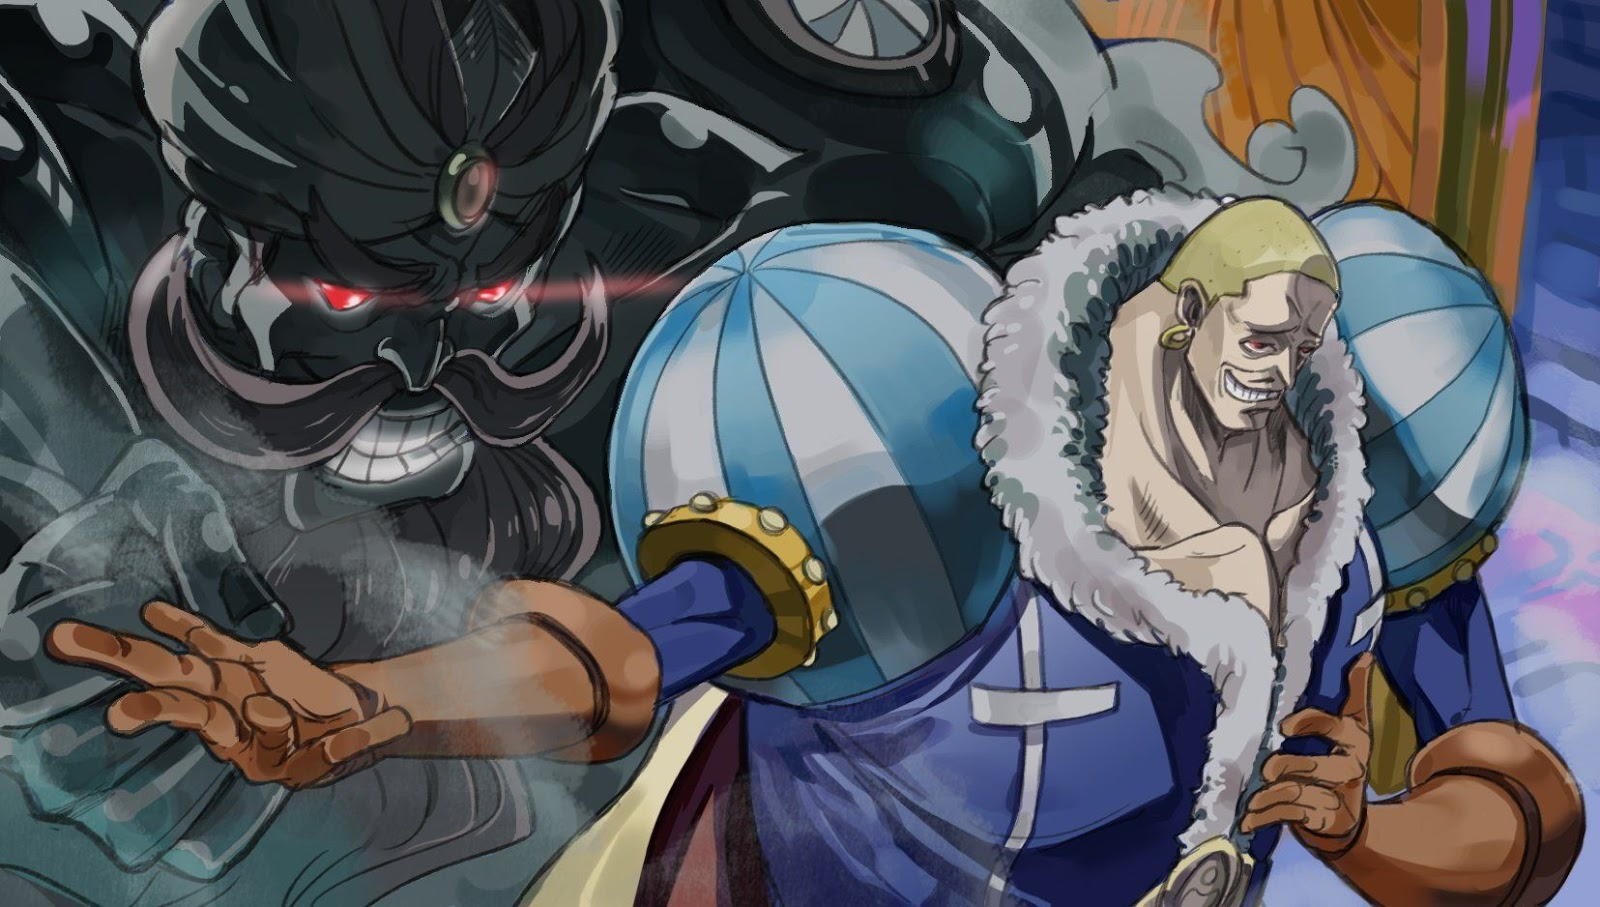 7 Karakter Anime Yang Bertarung Tanpa Menggerakkan Tubuh ...